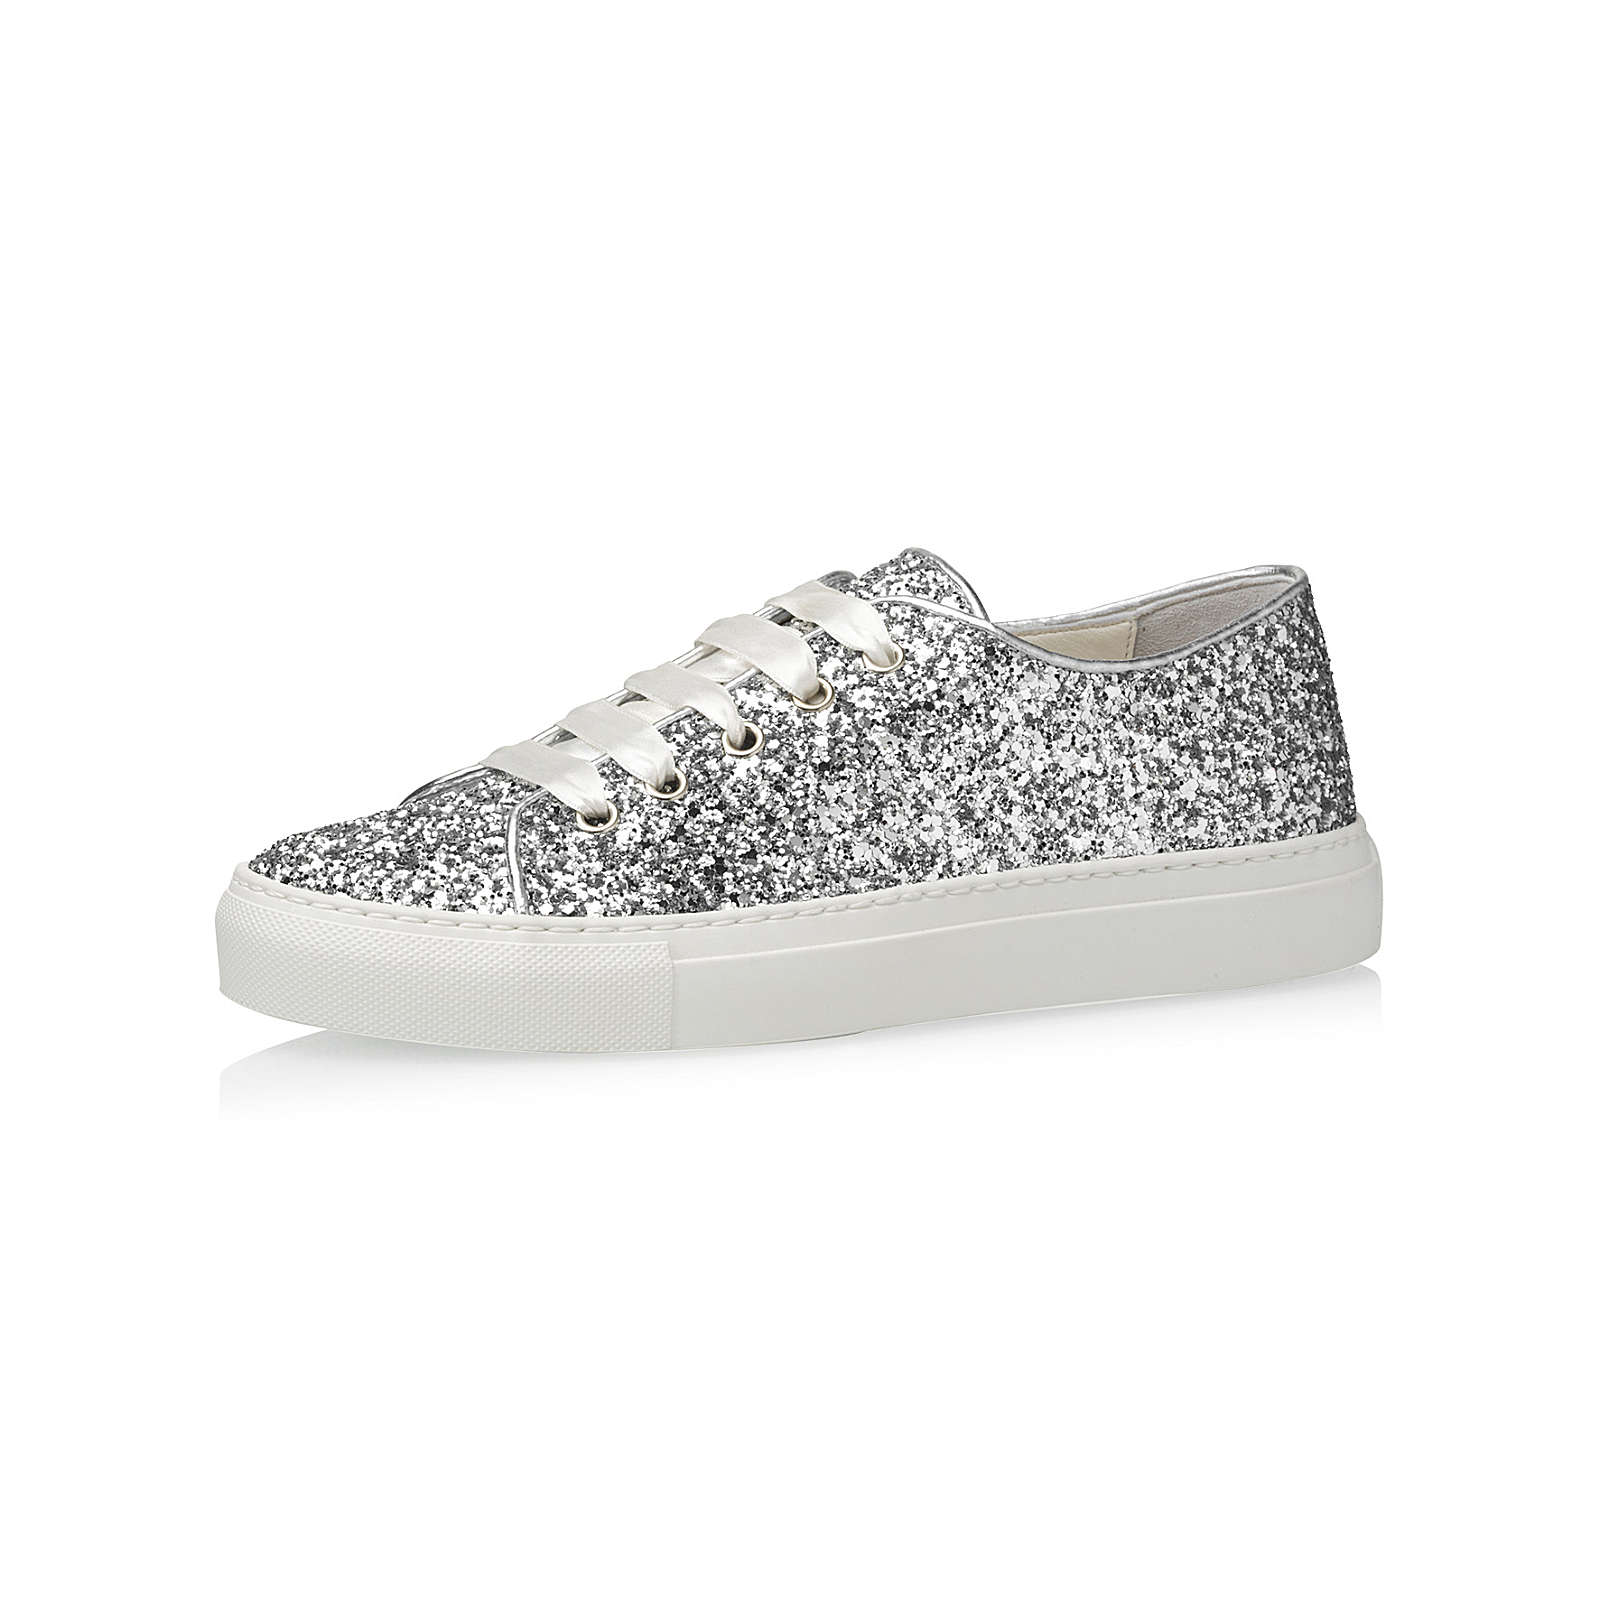 Elsa Coloured Shoes Fiarucci Brautschuhe Suzan-silber Sneakers Low silber Damen Gr. 39